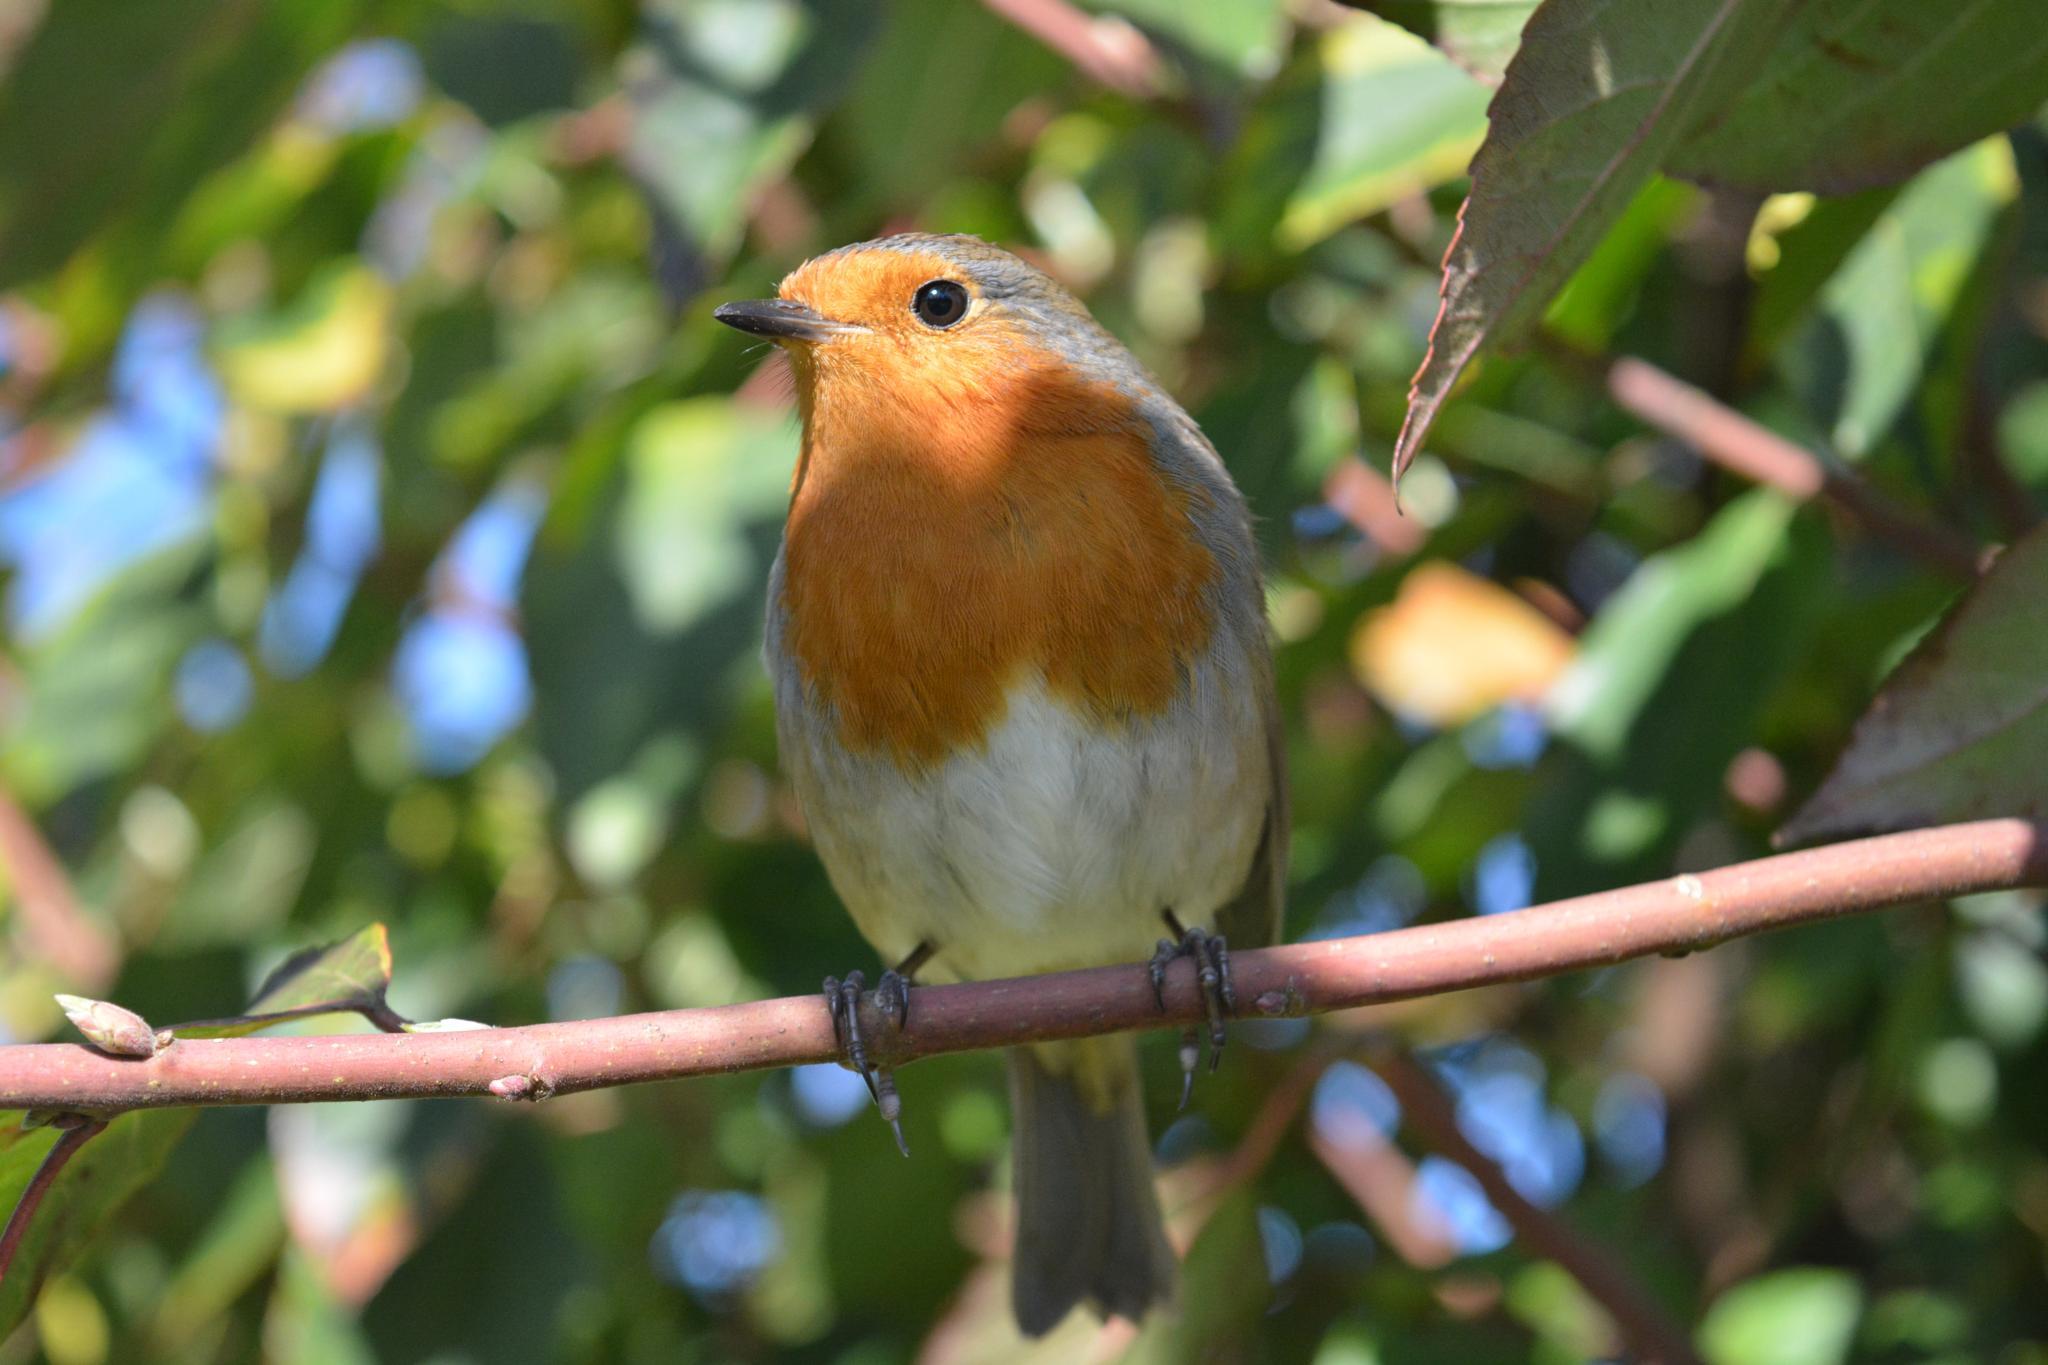 Robin by Ronan Feehan